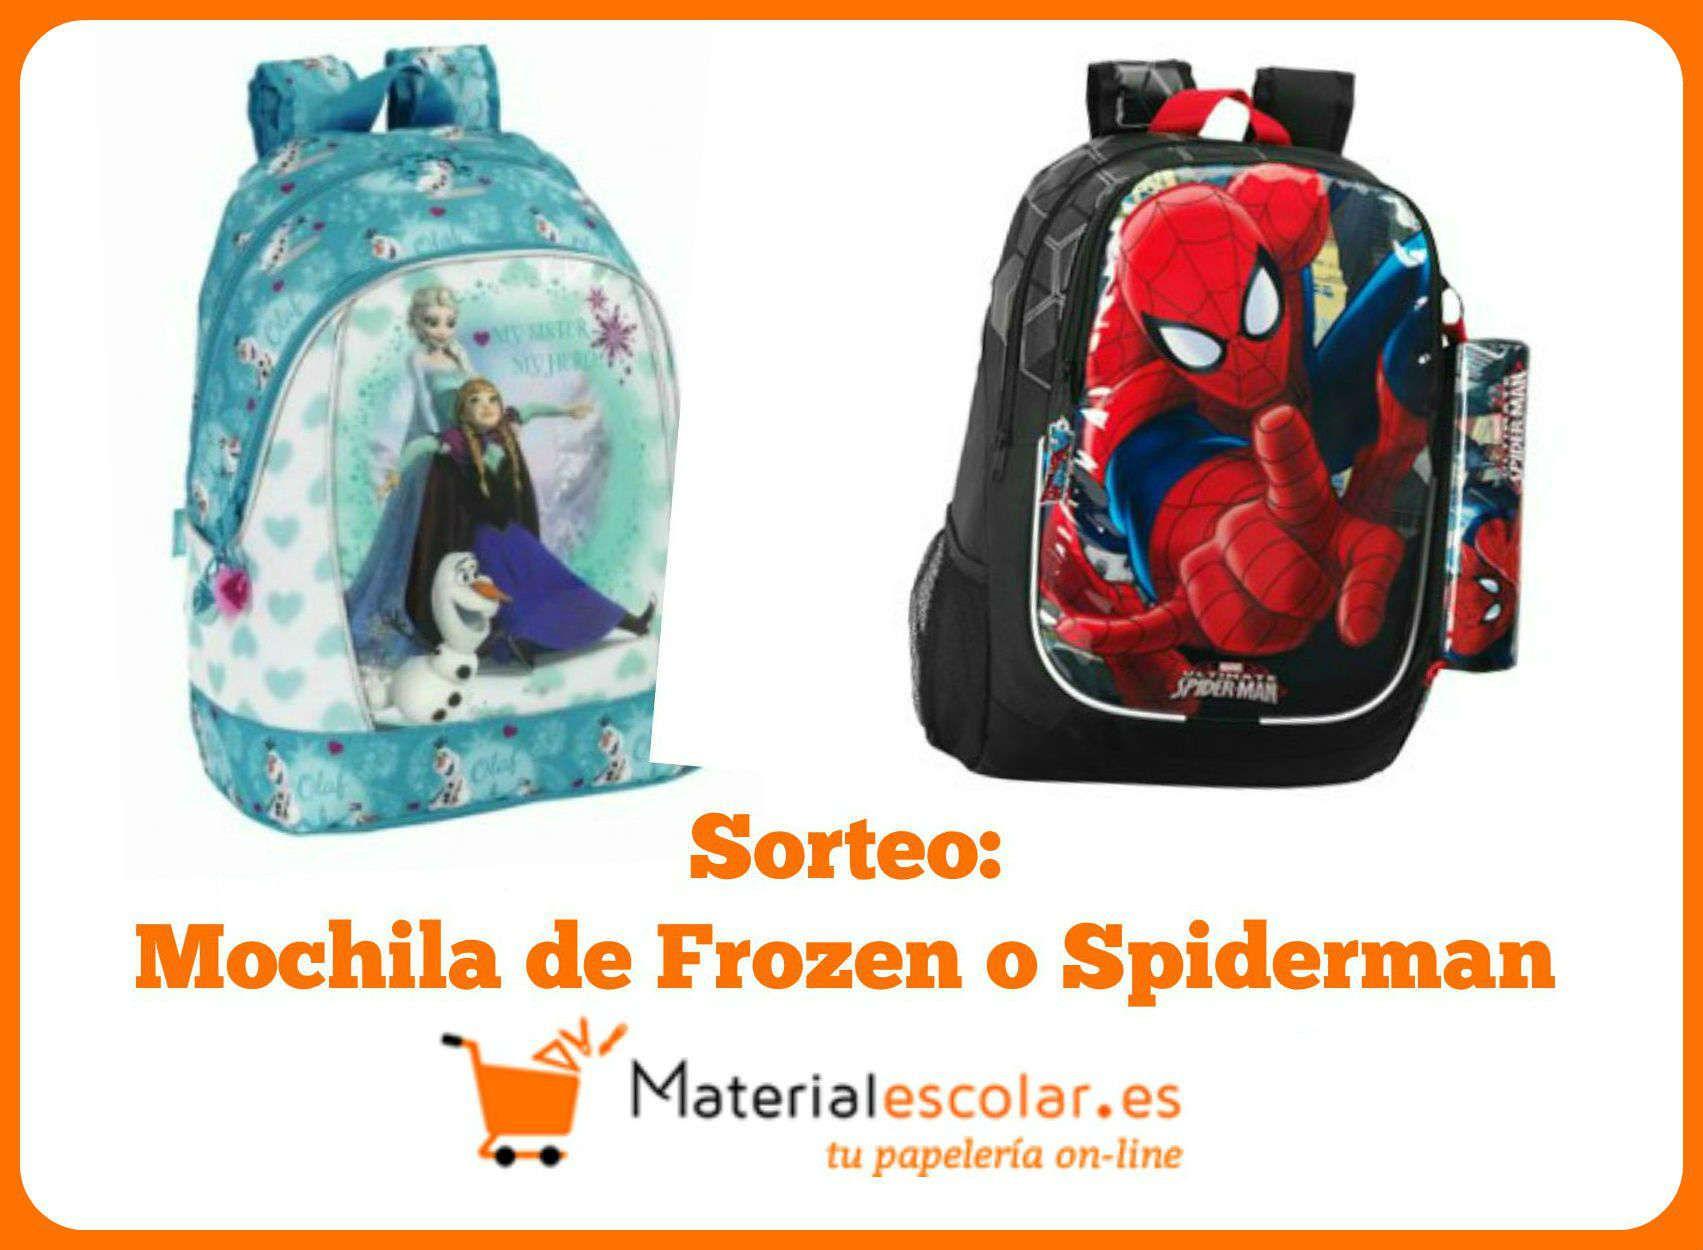 gana-una-hermosa-mochila-de-frozen-o-spiderman